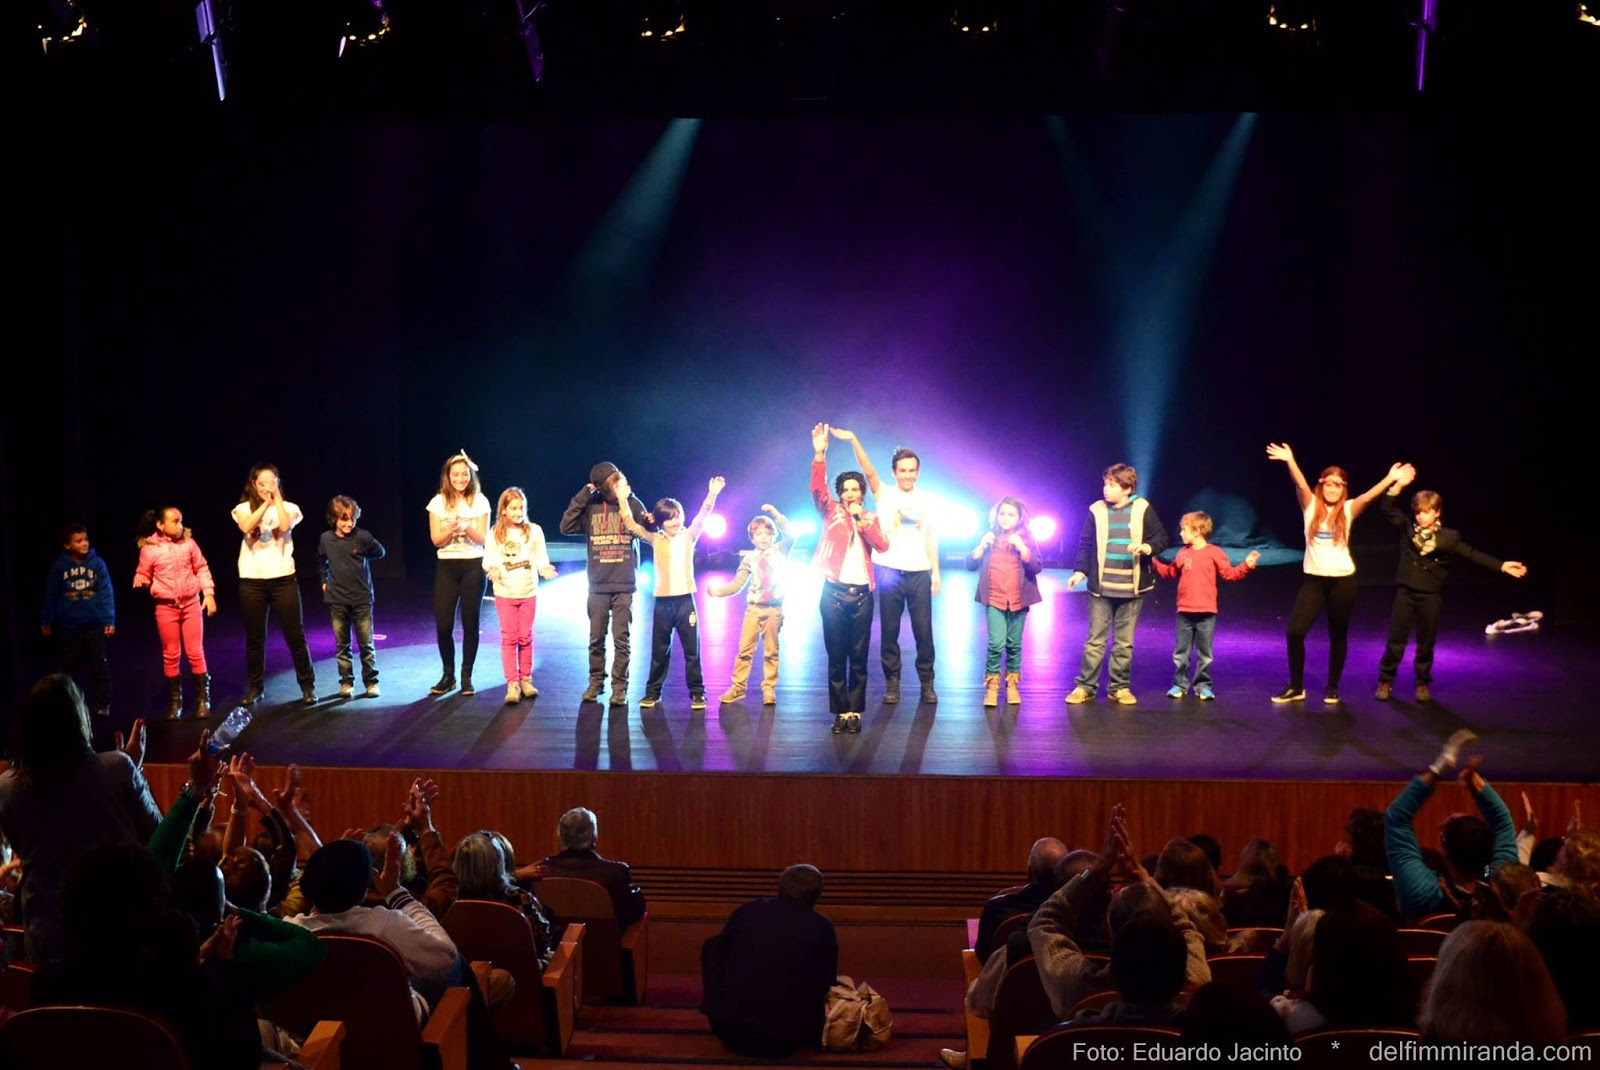 Delfim Miranda - Michael Jackson Tribute - Heal the World - Public and Stage